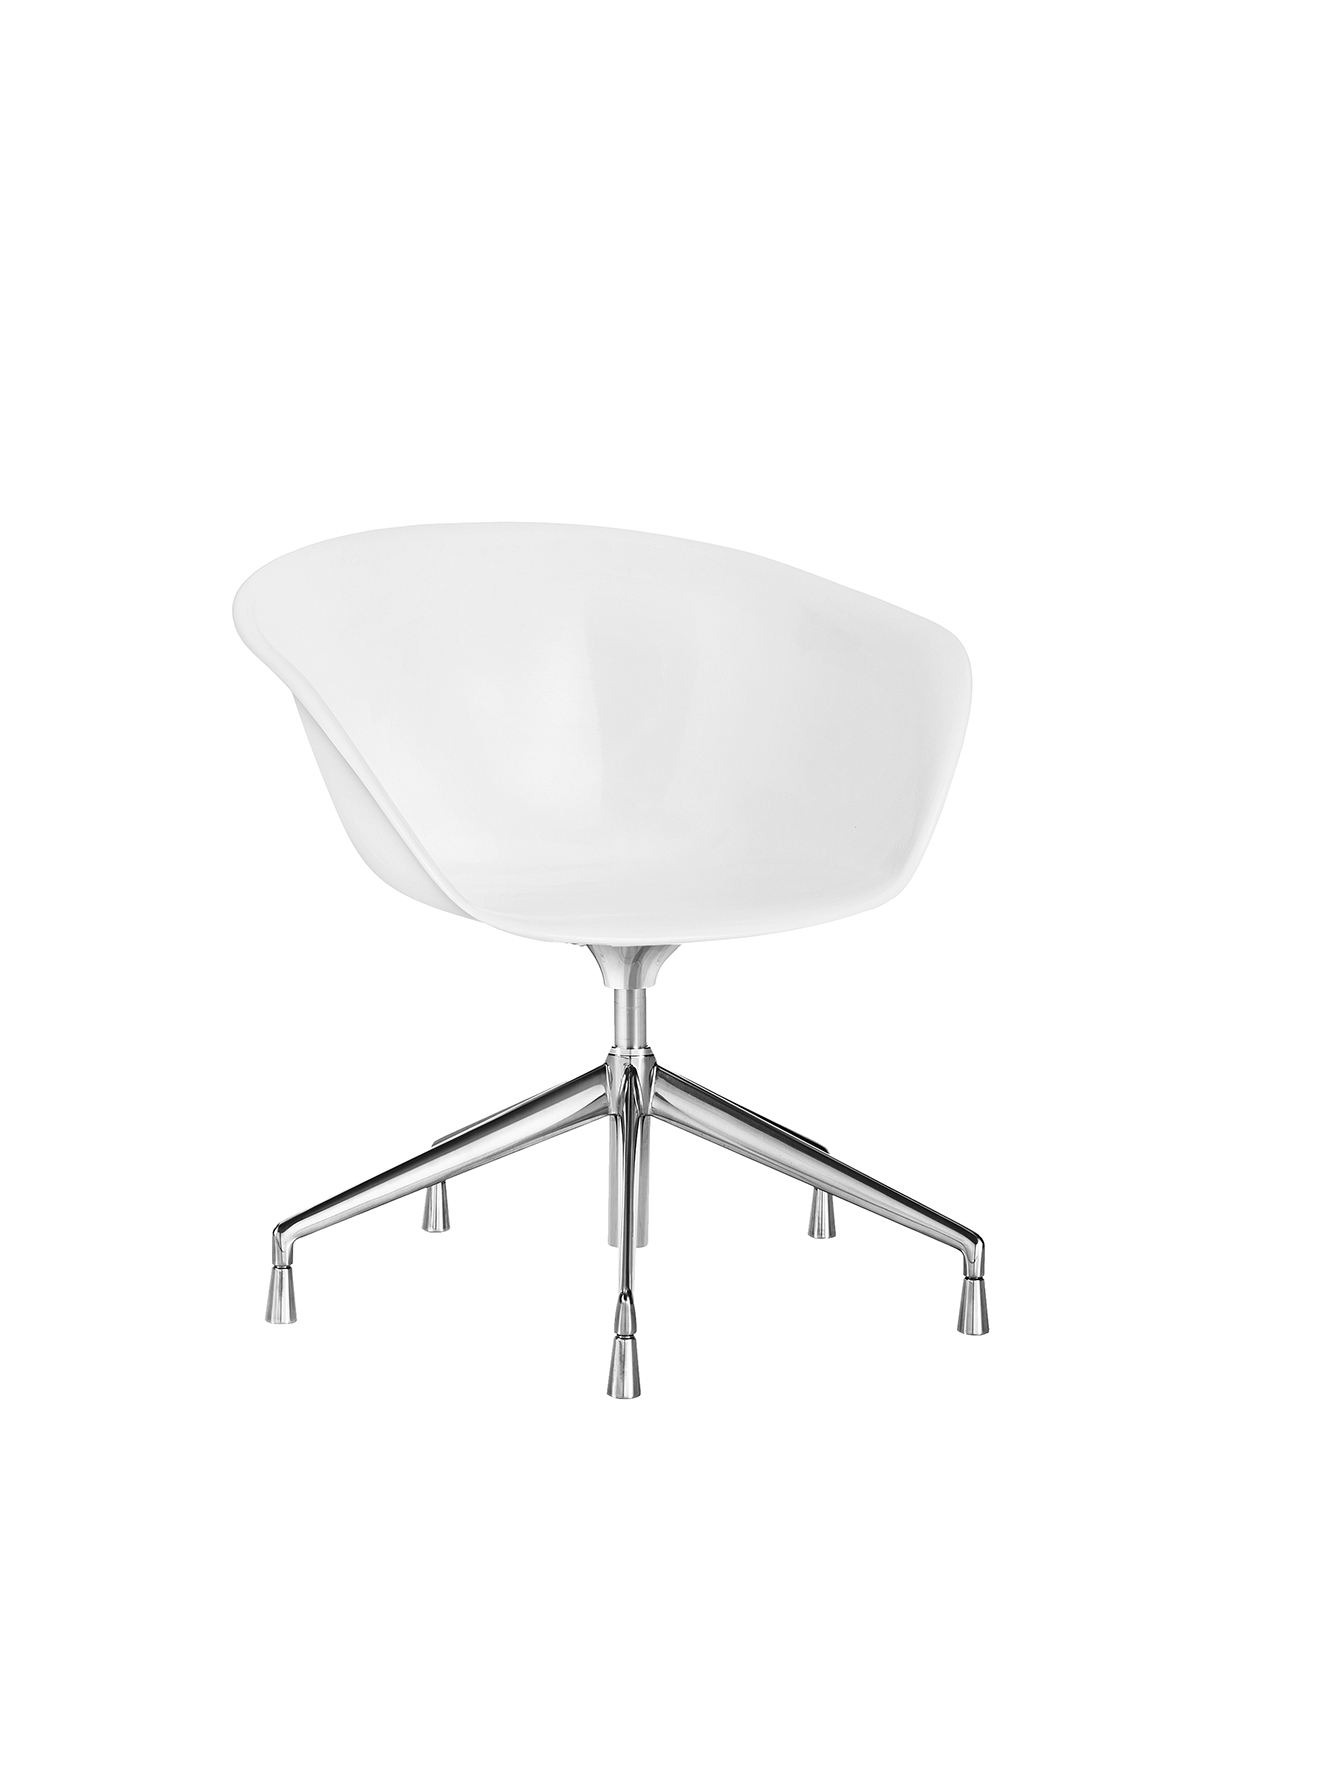 Duna02 4208 chair by Arper